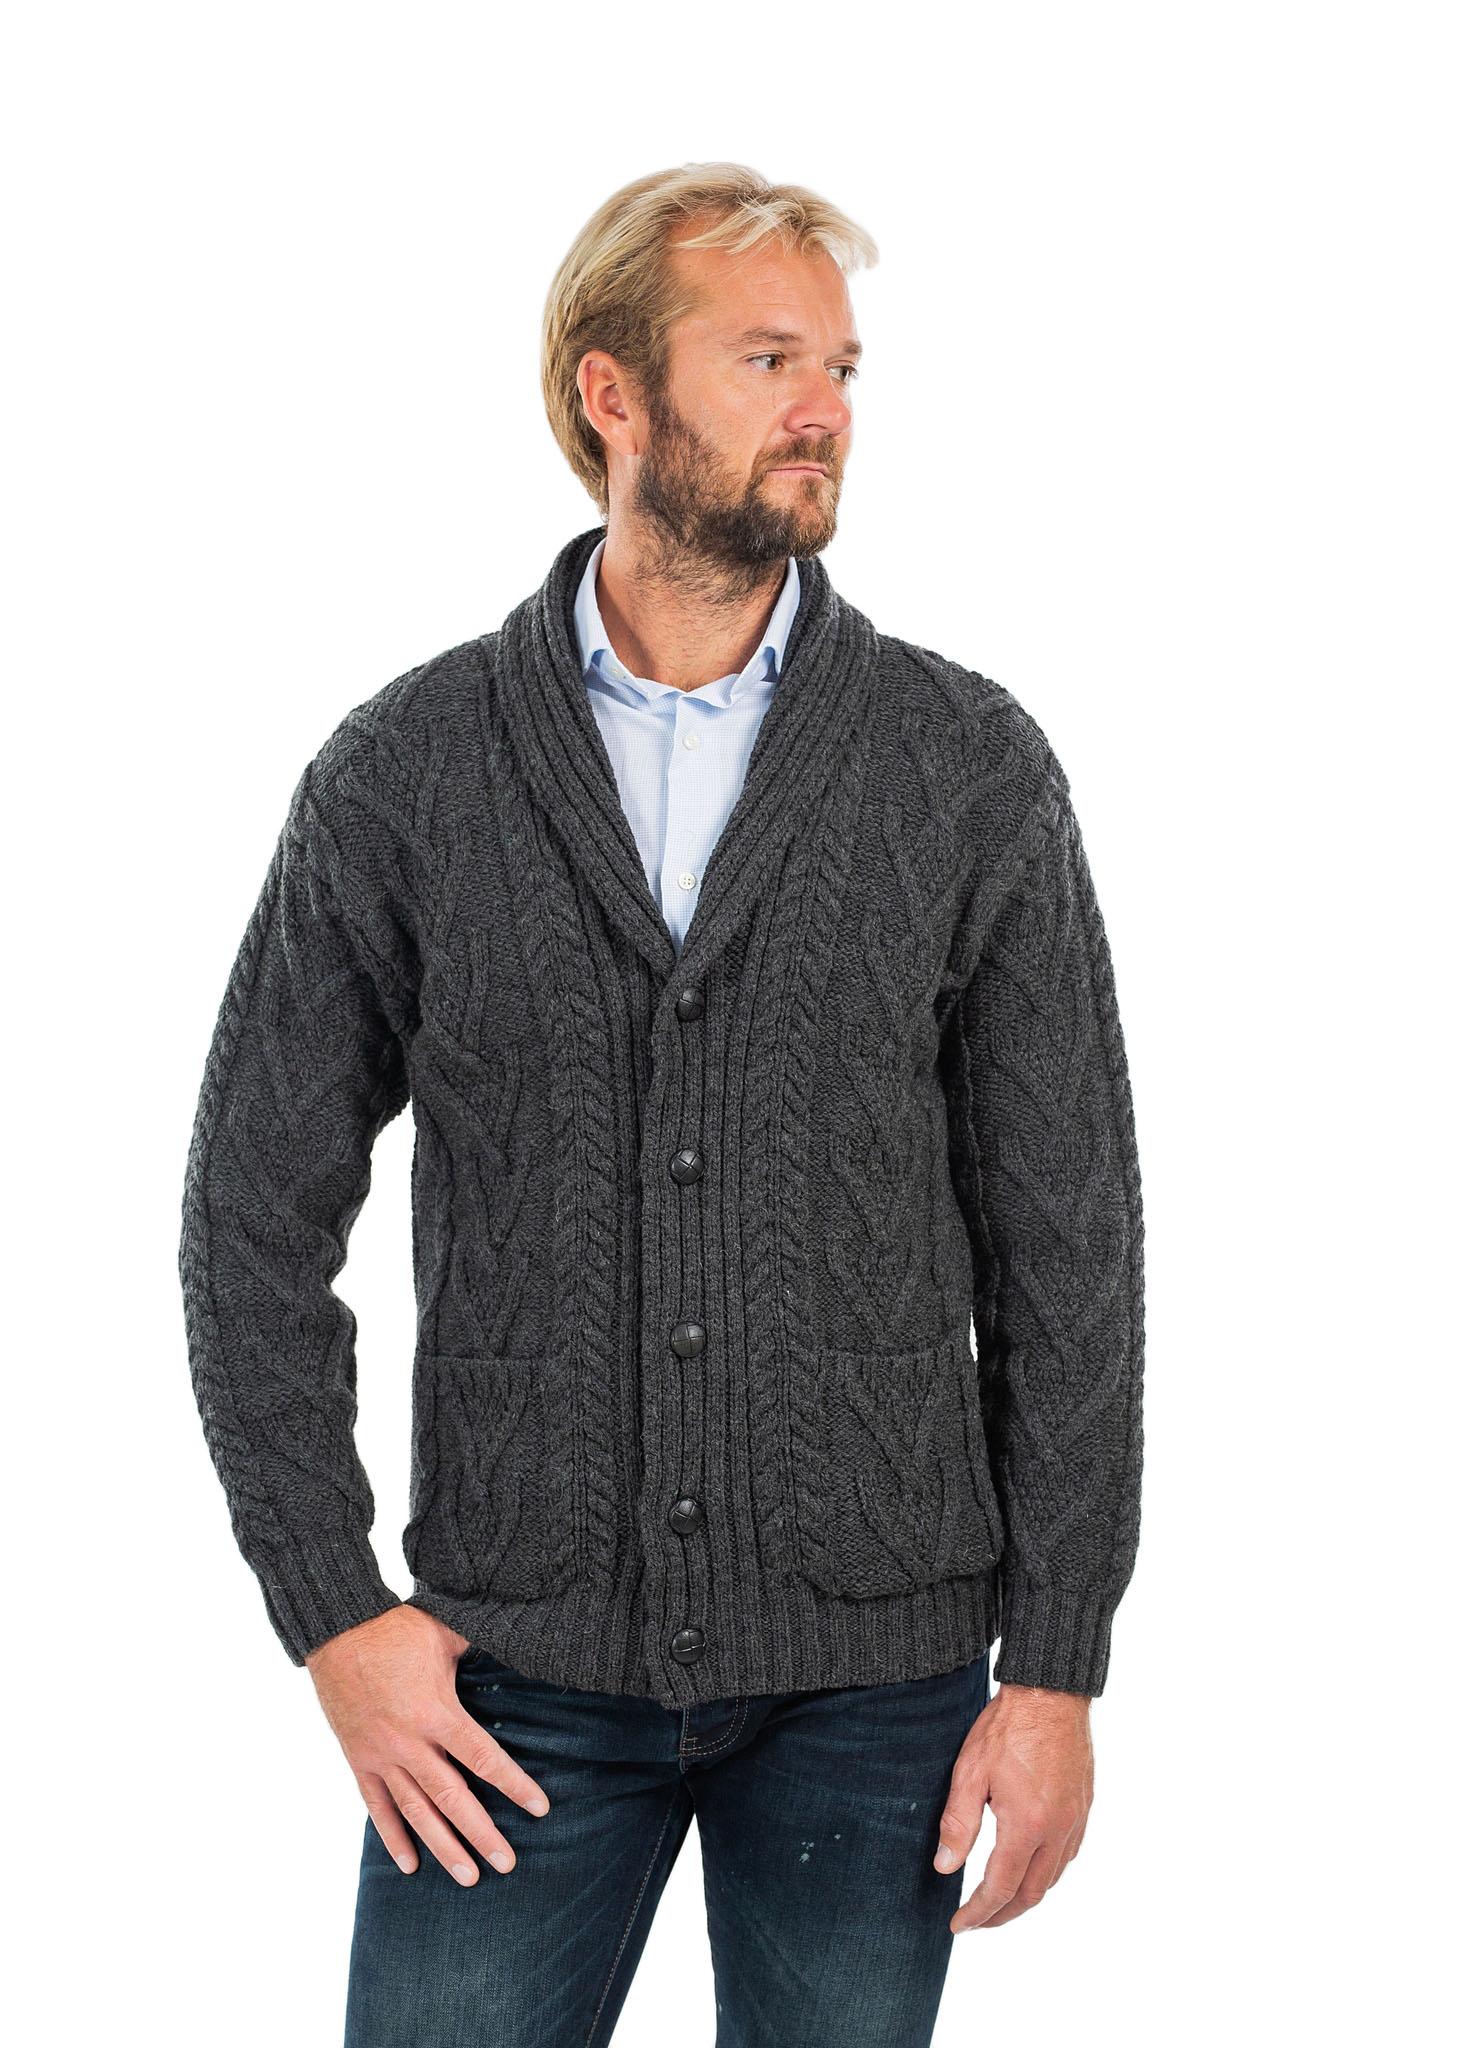 SAOL-Mens-Irish-Merino-Wool-Cardigan-Shawl-Collar-Front-Pockets-Aran-Cable-Knit thumbnail 34